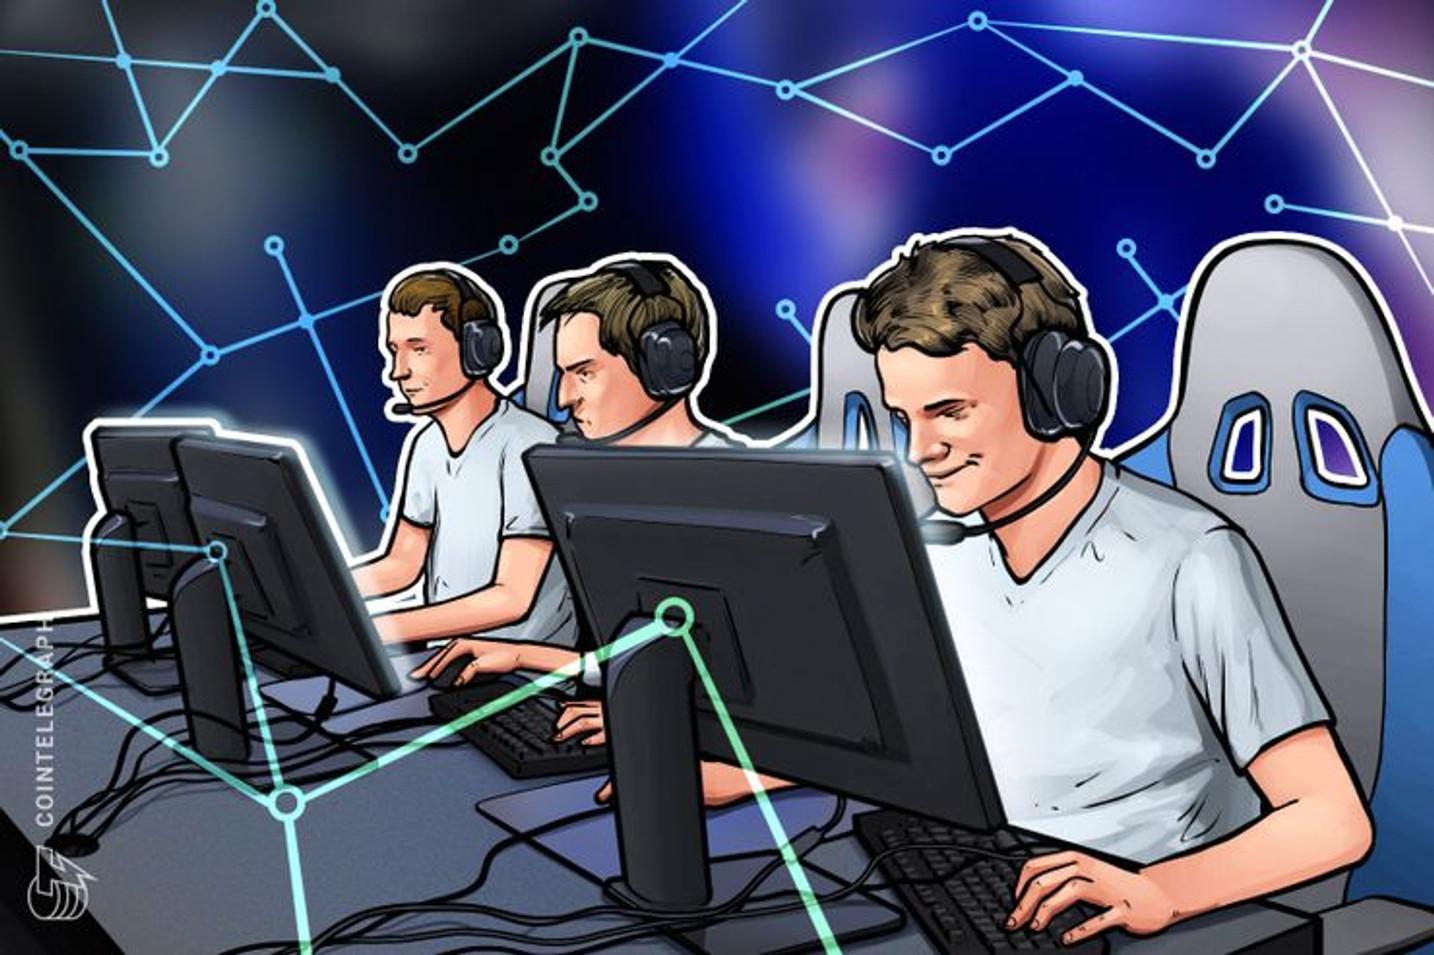 Problema técnico na CloudFlare derruba grandes sites de criptomoedas